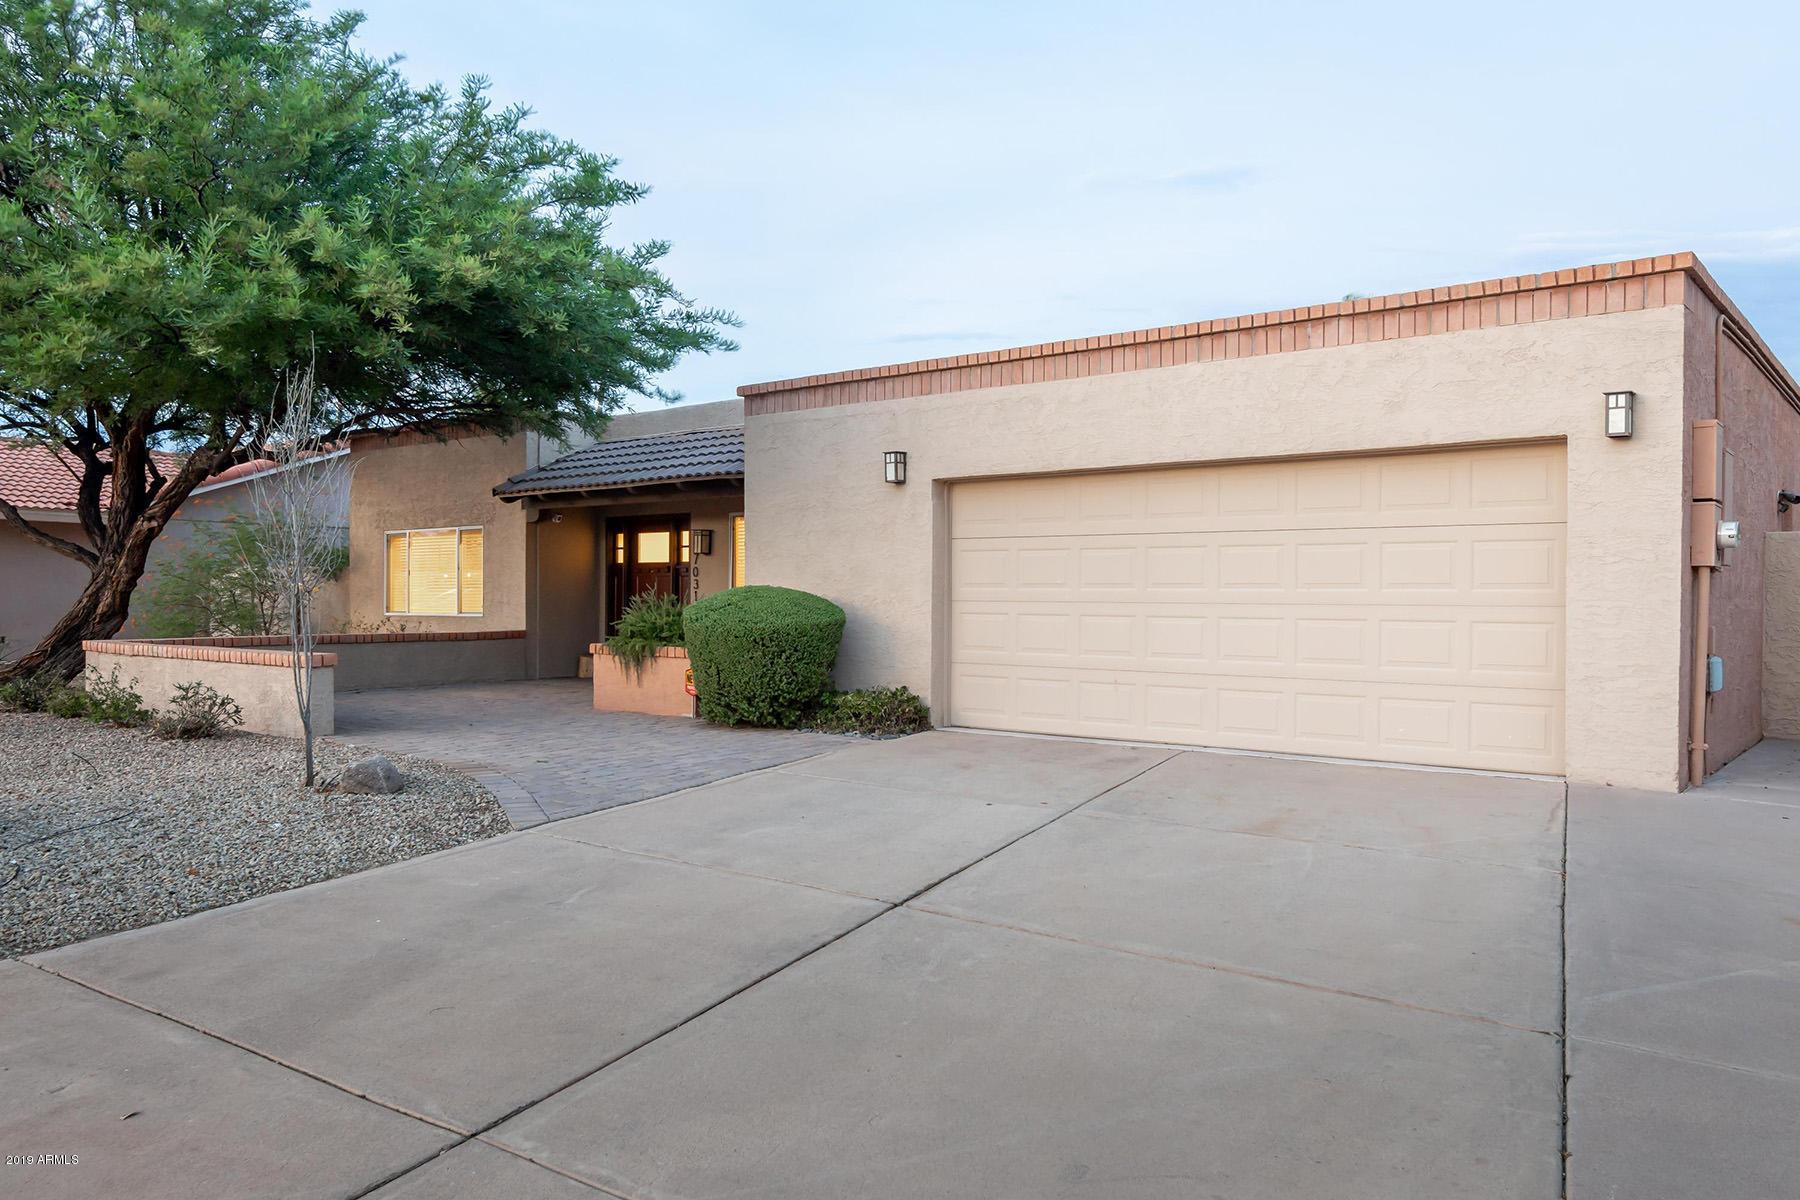 MLS 5972193 7031 N VIA DEL ELEMENTAL --, Scottsdale, AZ 85258 Scottsdale AZ Private Pool